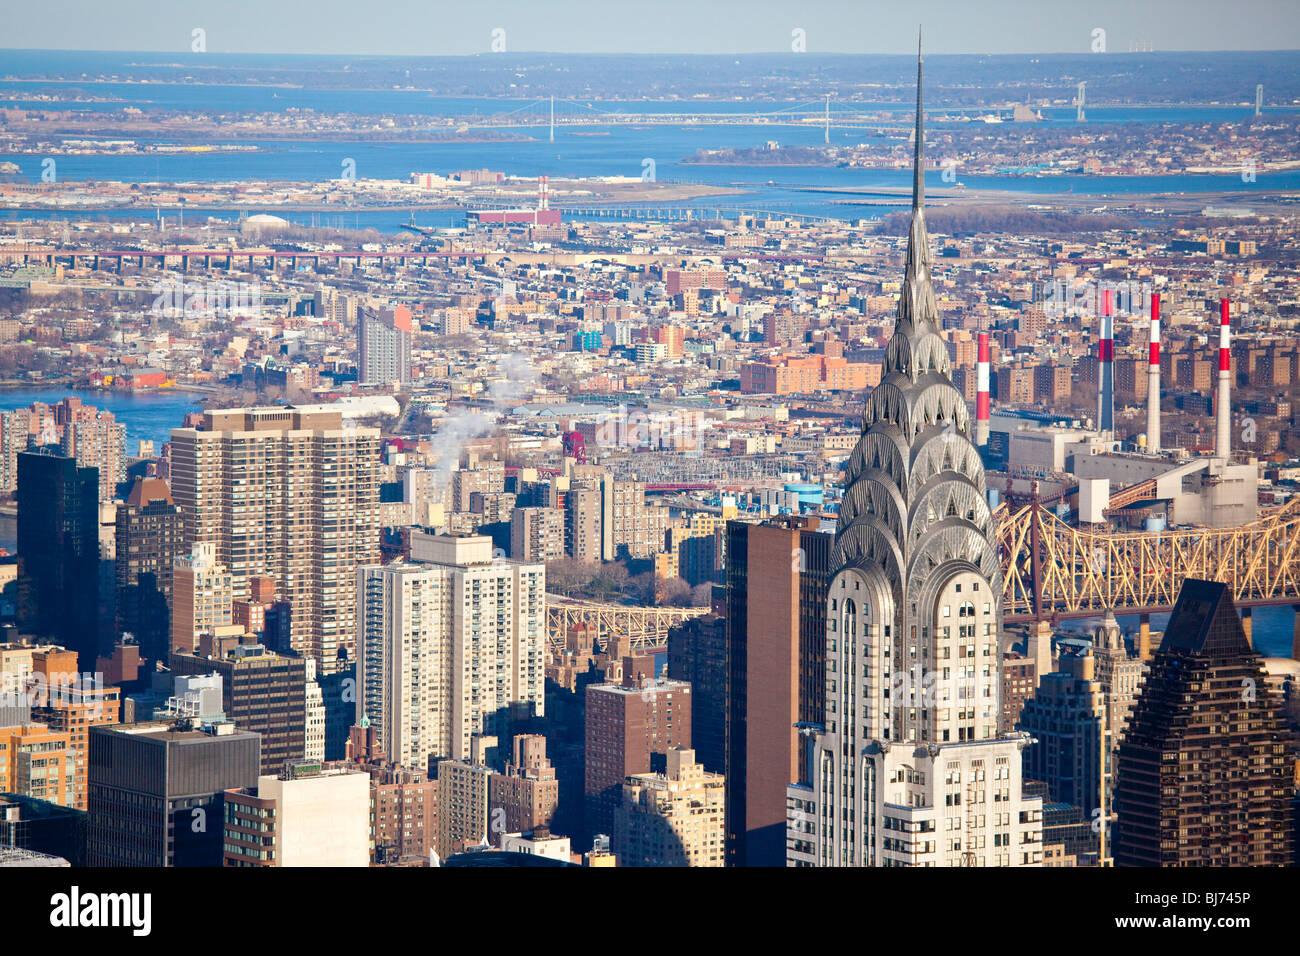 Chrysler Building, New York City - Stock Image